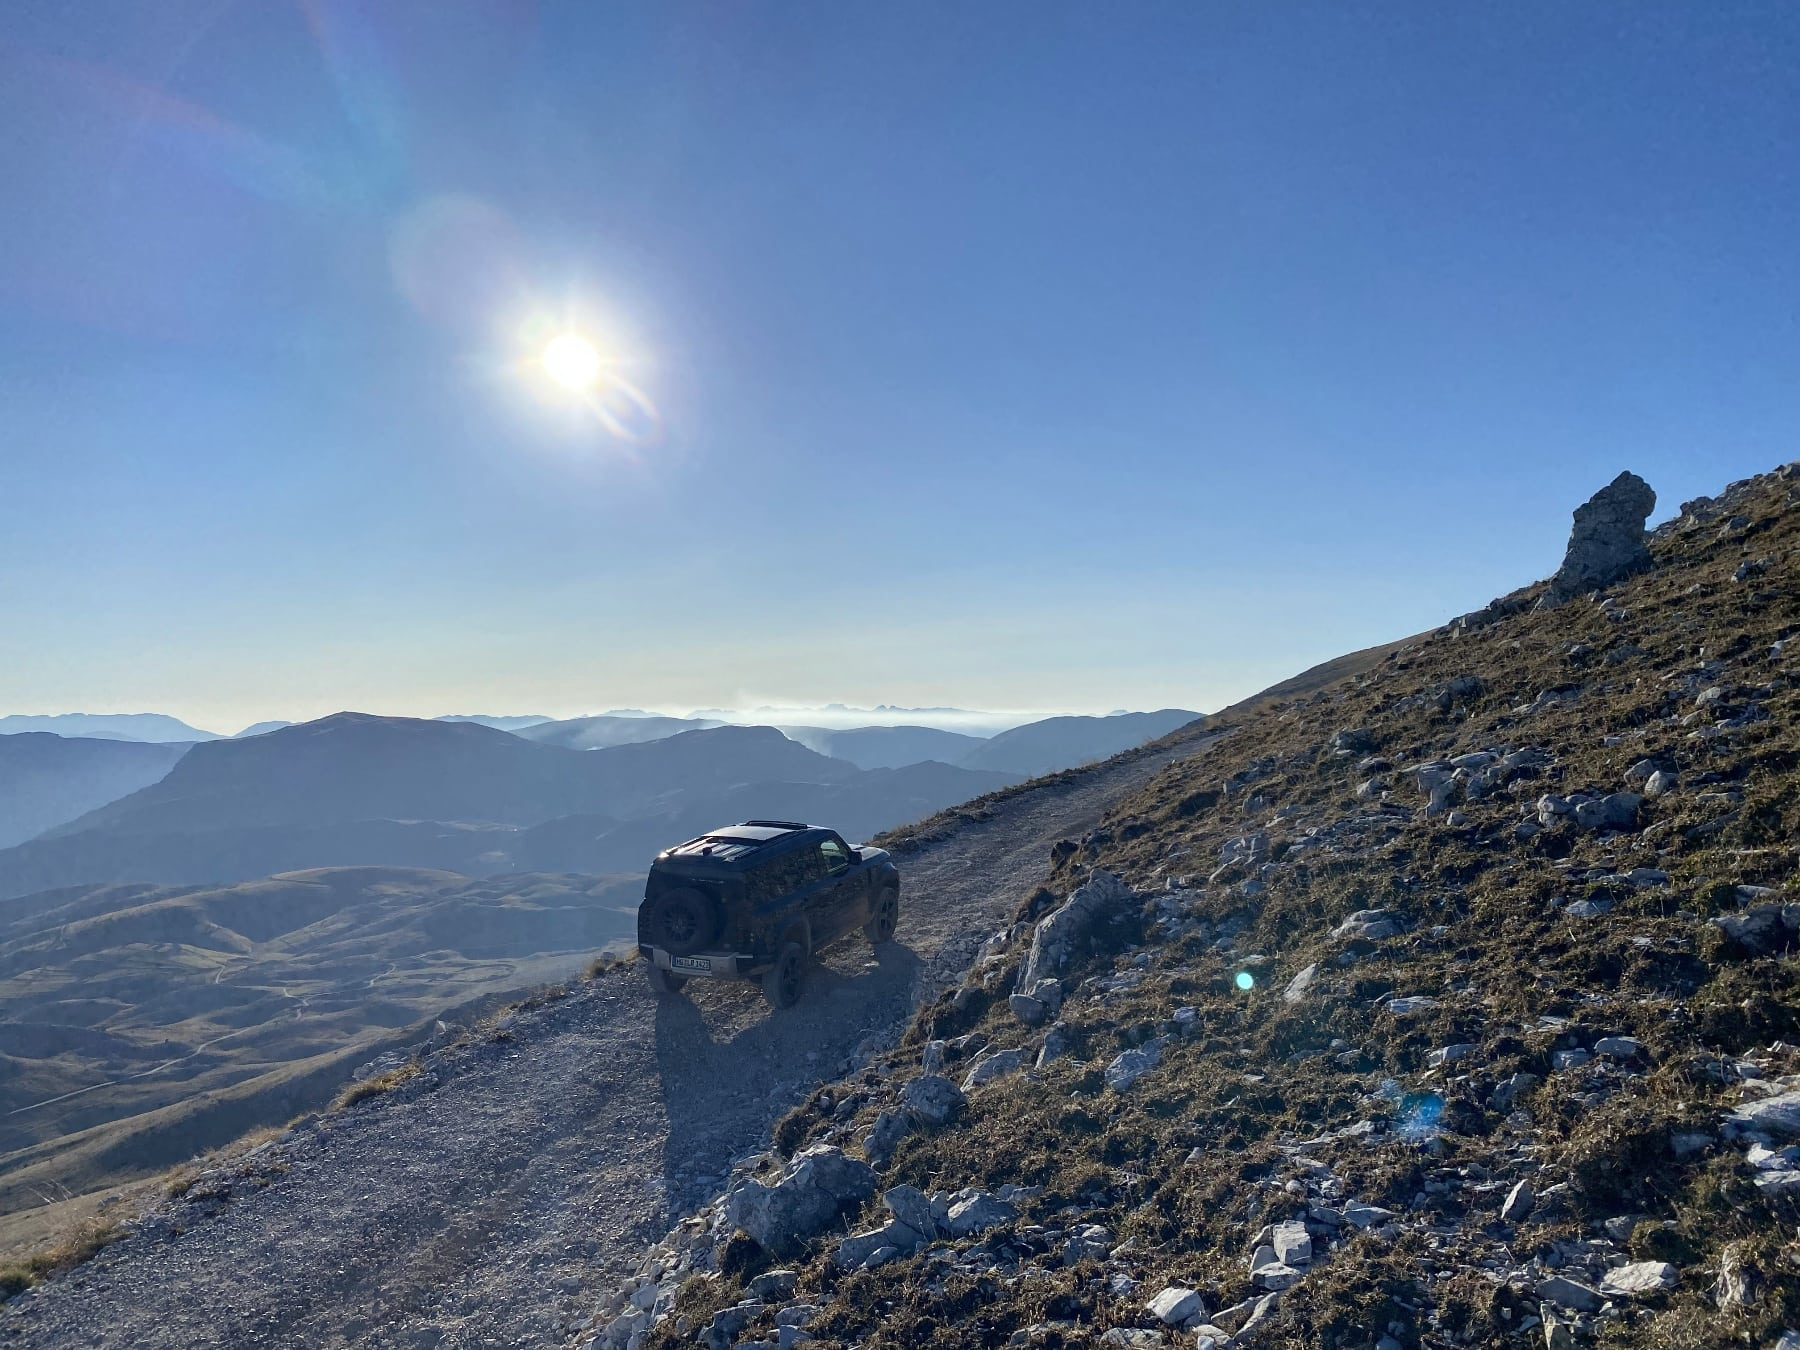 So close to heaven - In The Mountain Village Lukomir 1